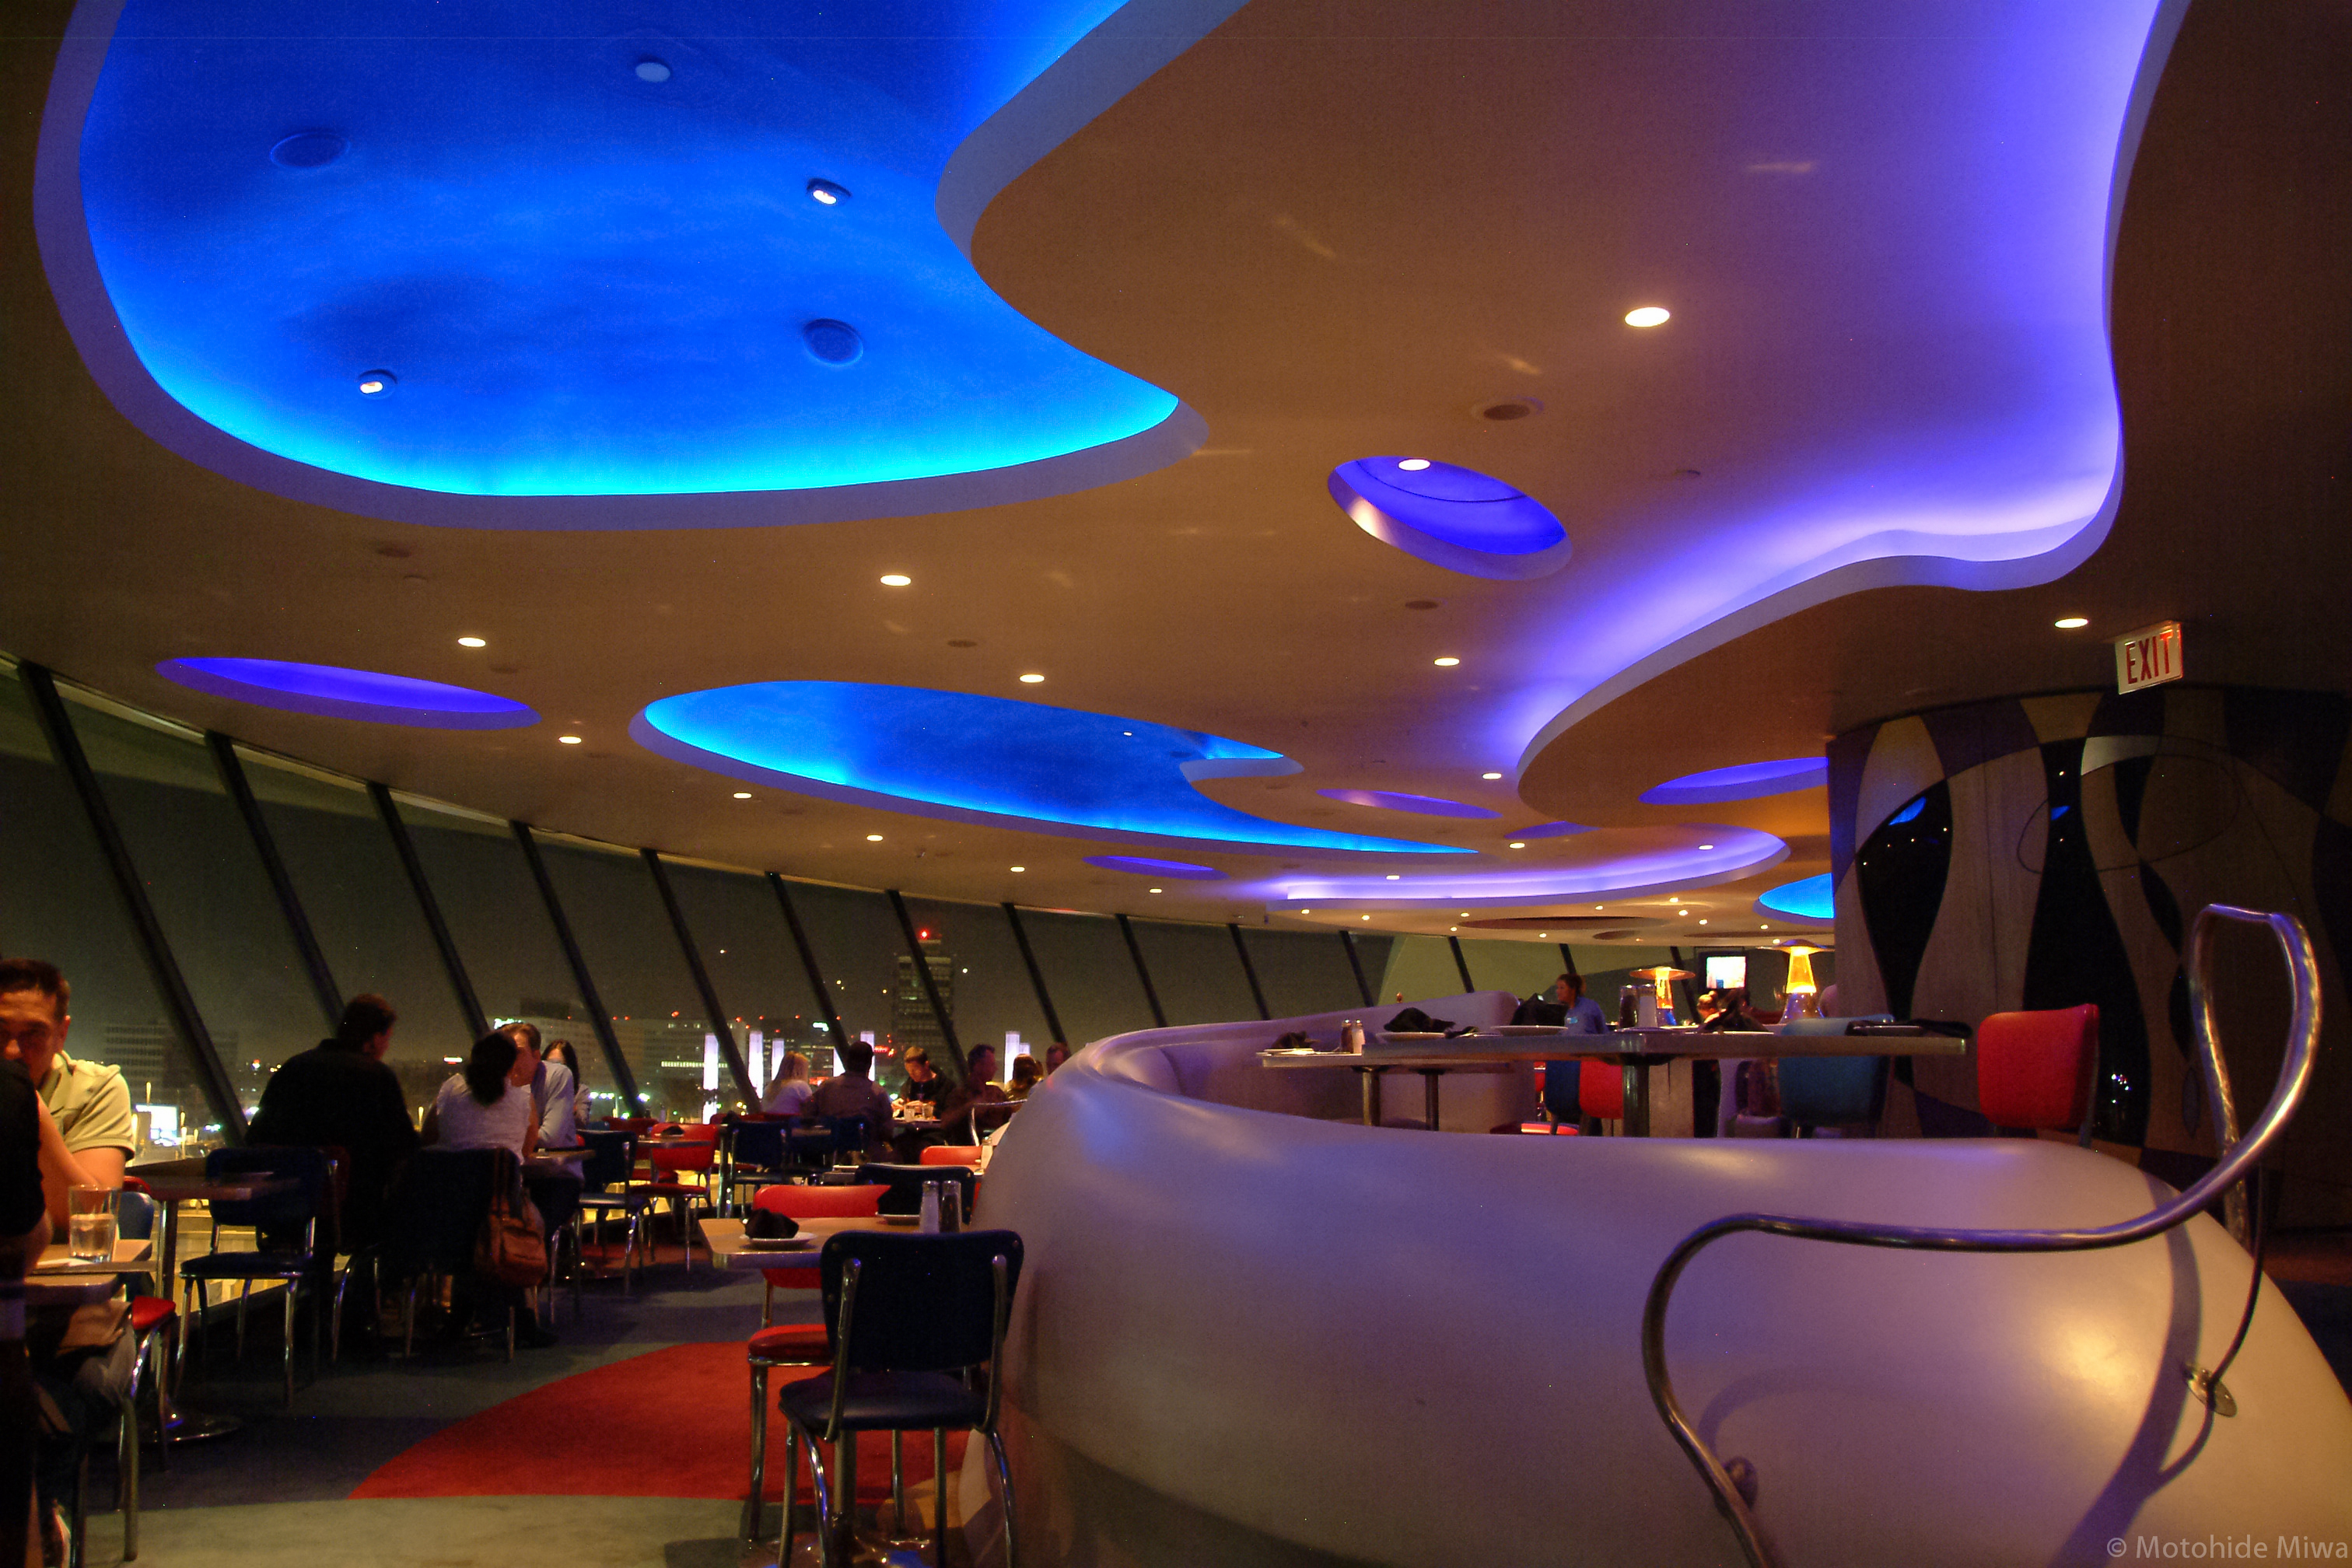 File Encounter Restaurant At Lax 4914747496 Jpg Wikimedia Commons